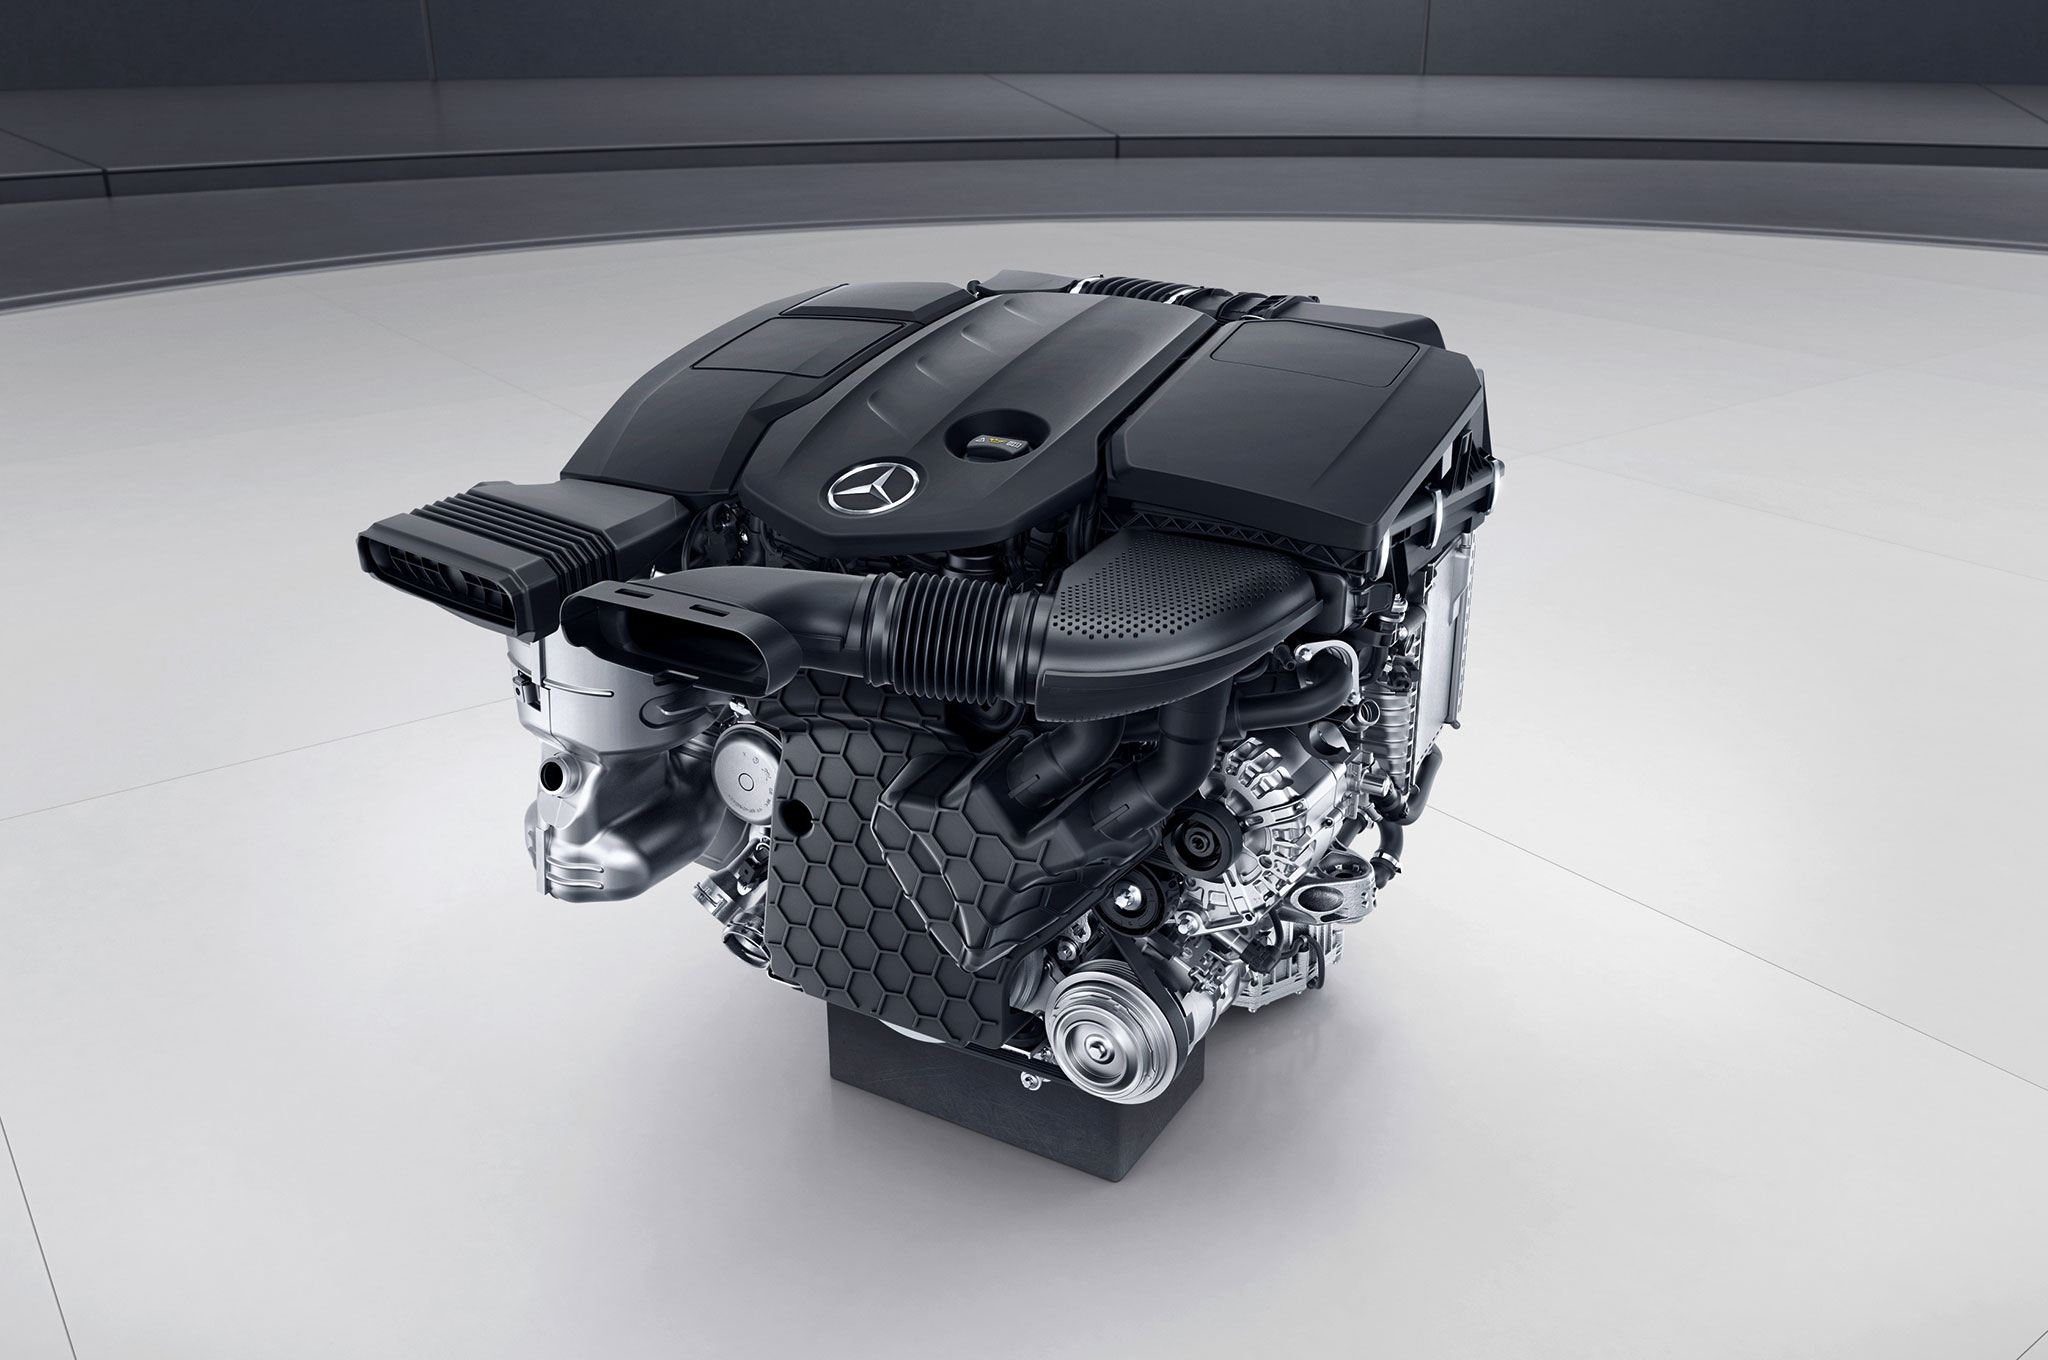 2018 Mercedes-Benz E350 Coupe and Cabrio Introduce Mild-Hybrid M 264